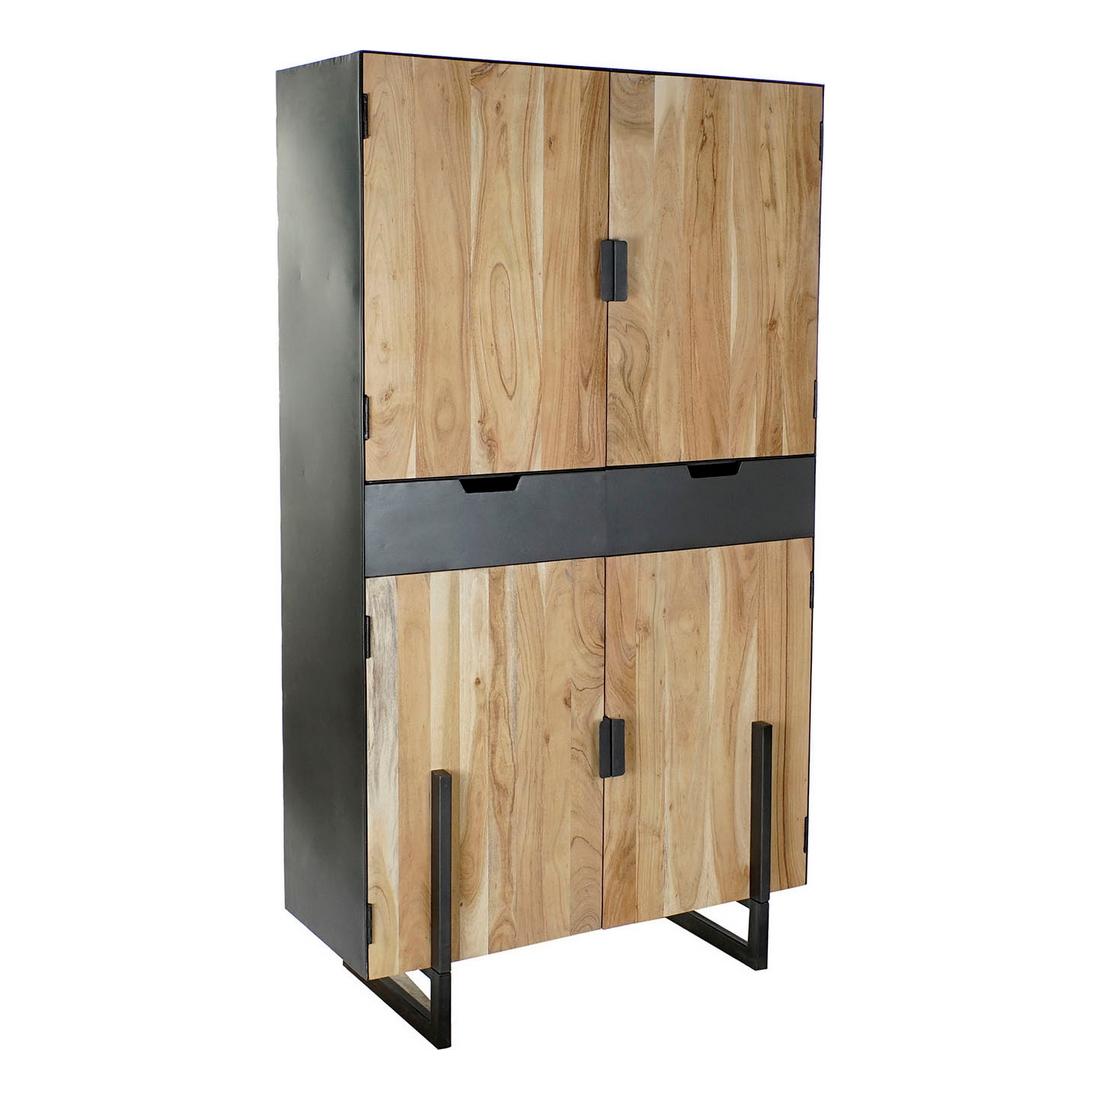 Armadio DKD Home Decor Metallo Acacia (100 x 45 x 185 cm)